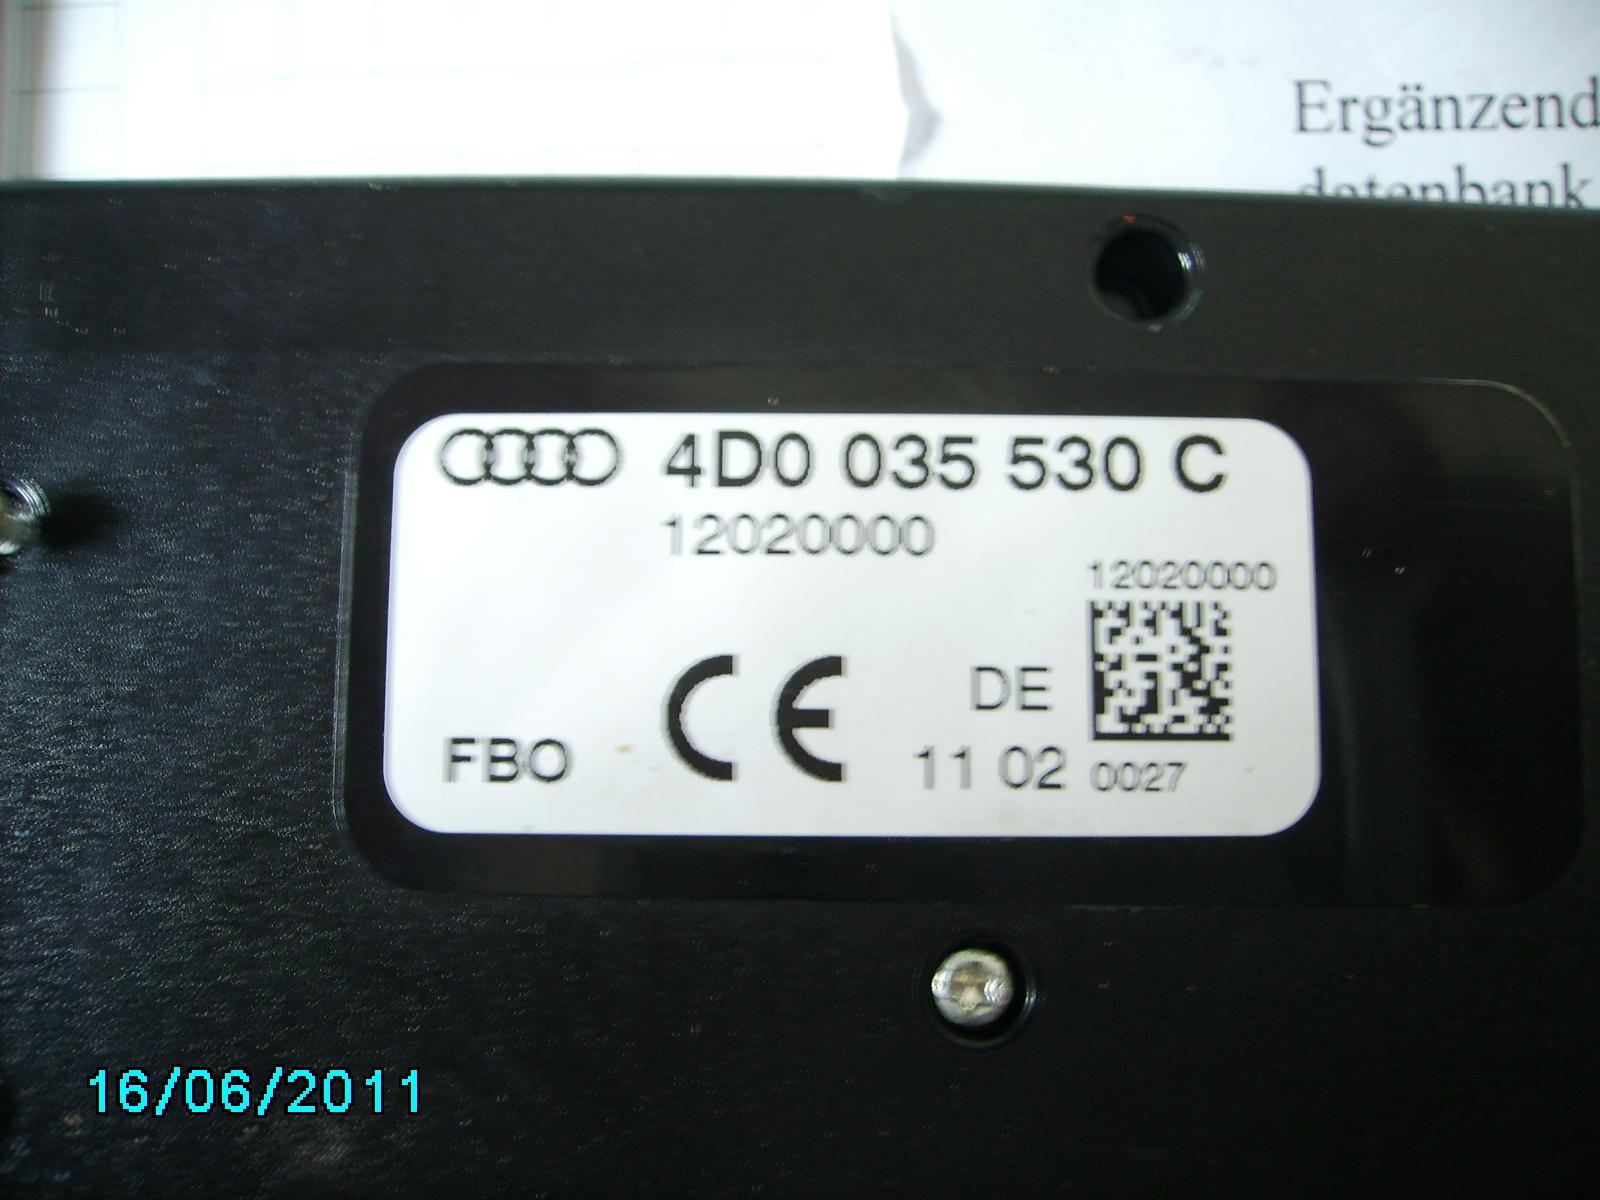 PICT3285.JPG.7c4136e8f01ac1fcbd77b99da5454ab1.JPG